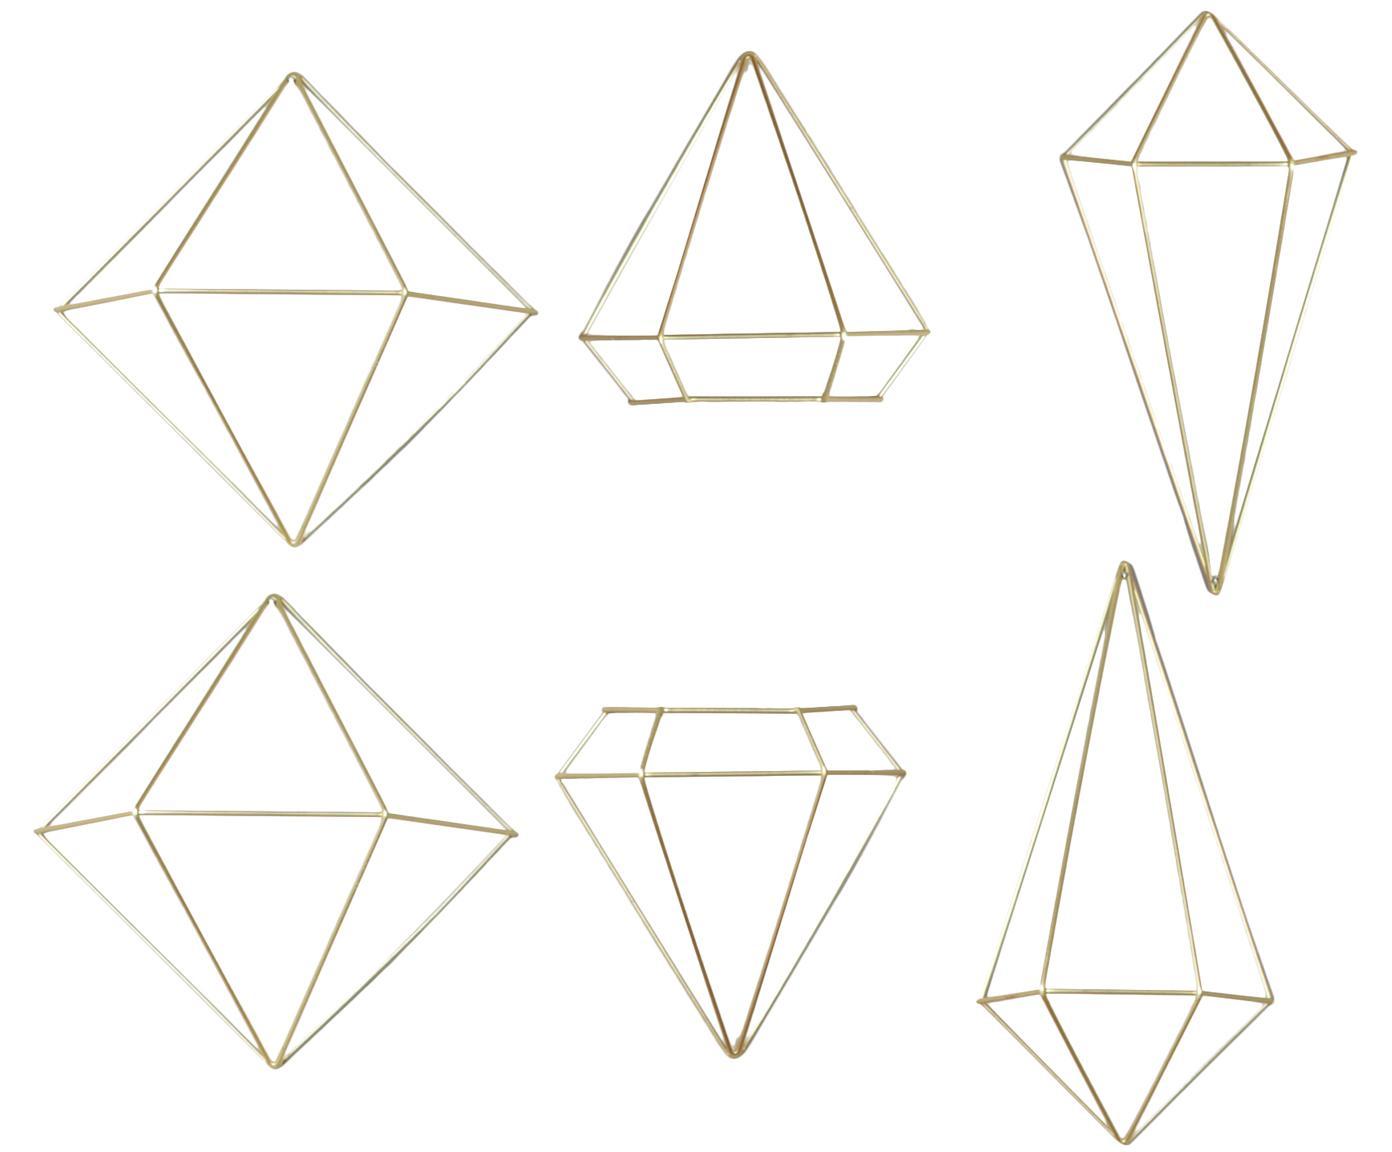 Wandobjekte-Set Prisma aus lackiertem Metall, 6-tlg., Metall, lackiert, Messingfarben, Verschiedene Grössen